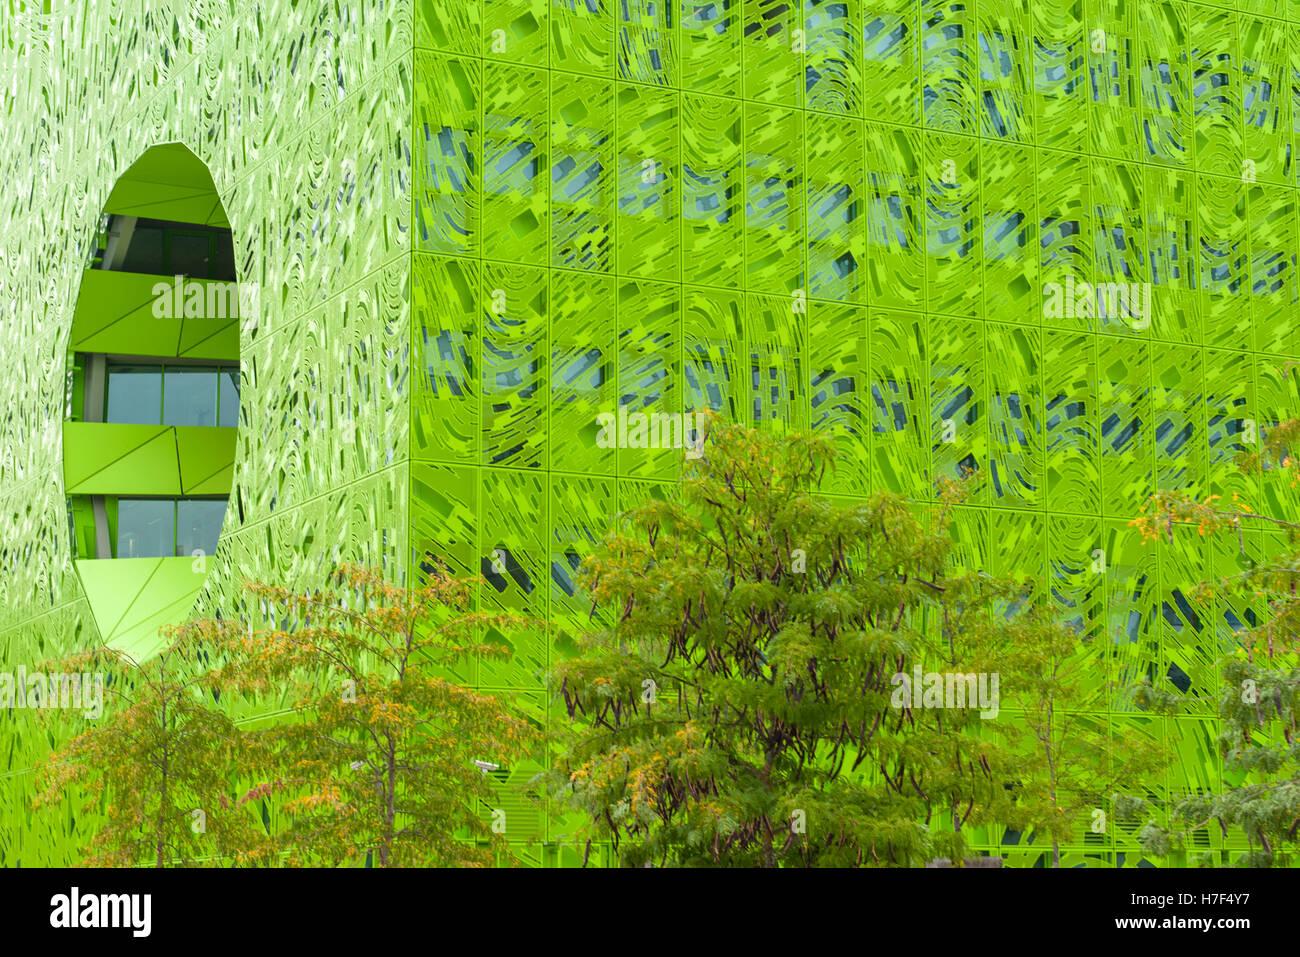 The cube vert building, designed by Jakob+MacFarlane, at La Confluence, Lyon, France - Stock Image